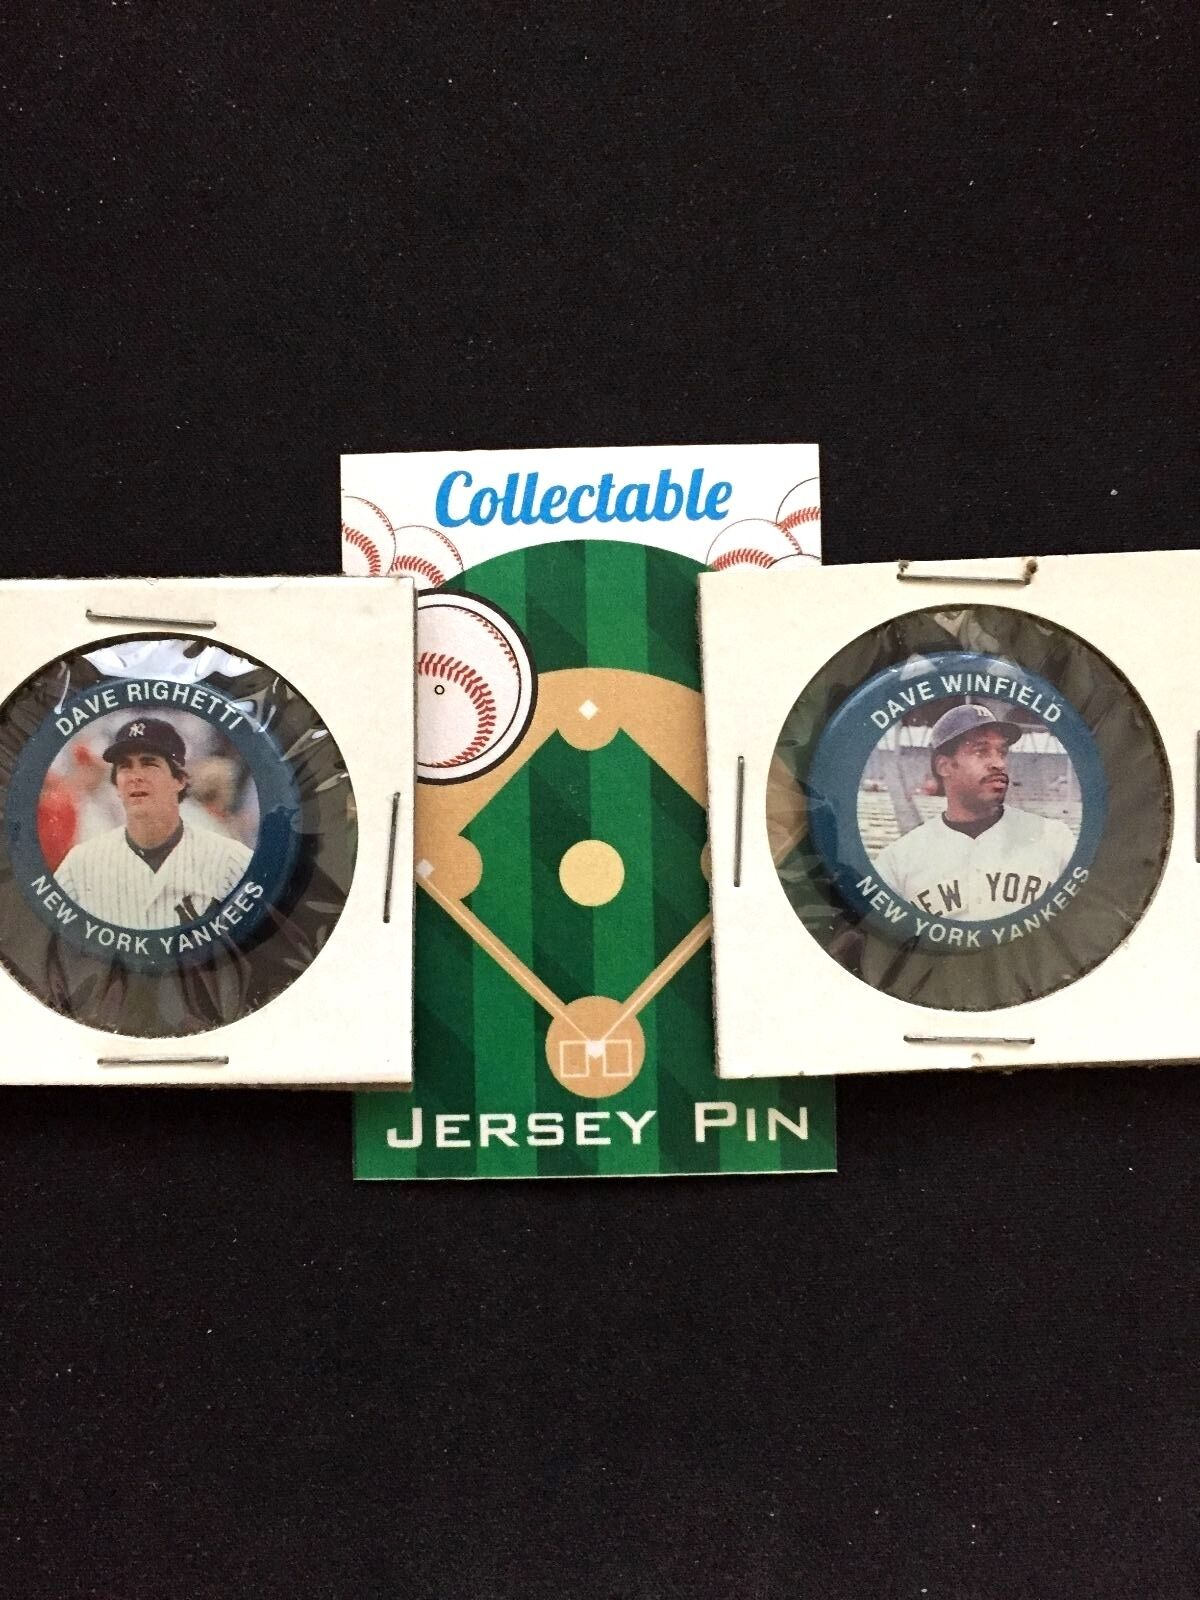 Nueva York Yankees Pins Pins Pins (2) -bronx Bombers- el Dave's